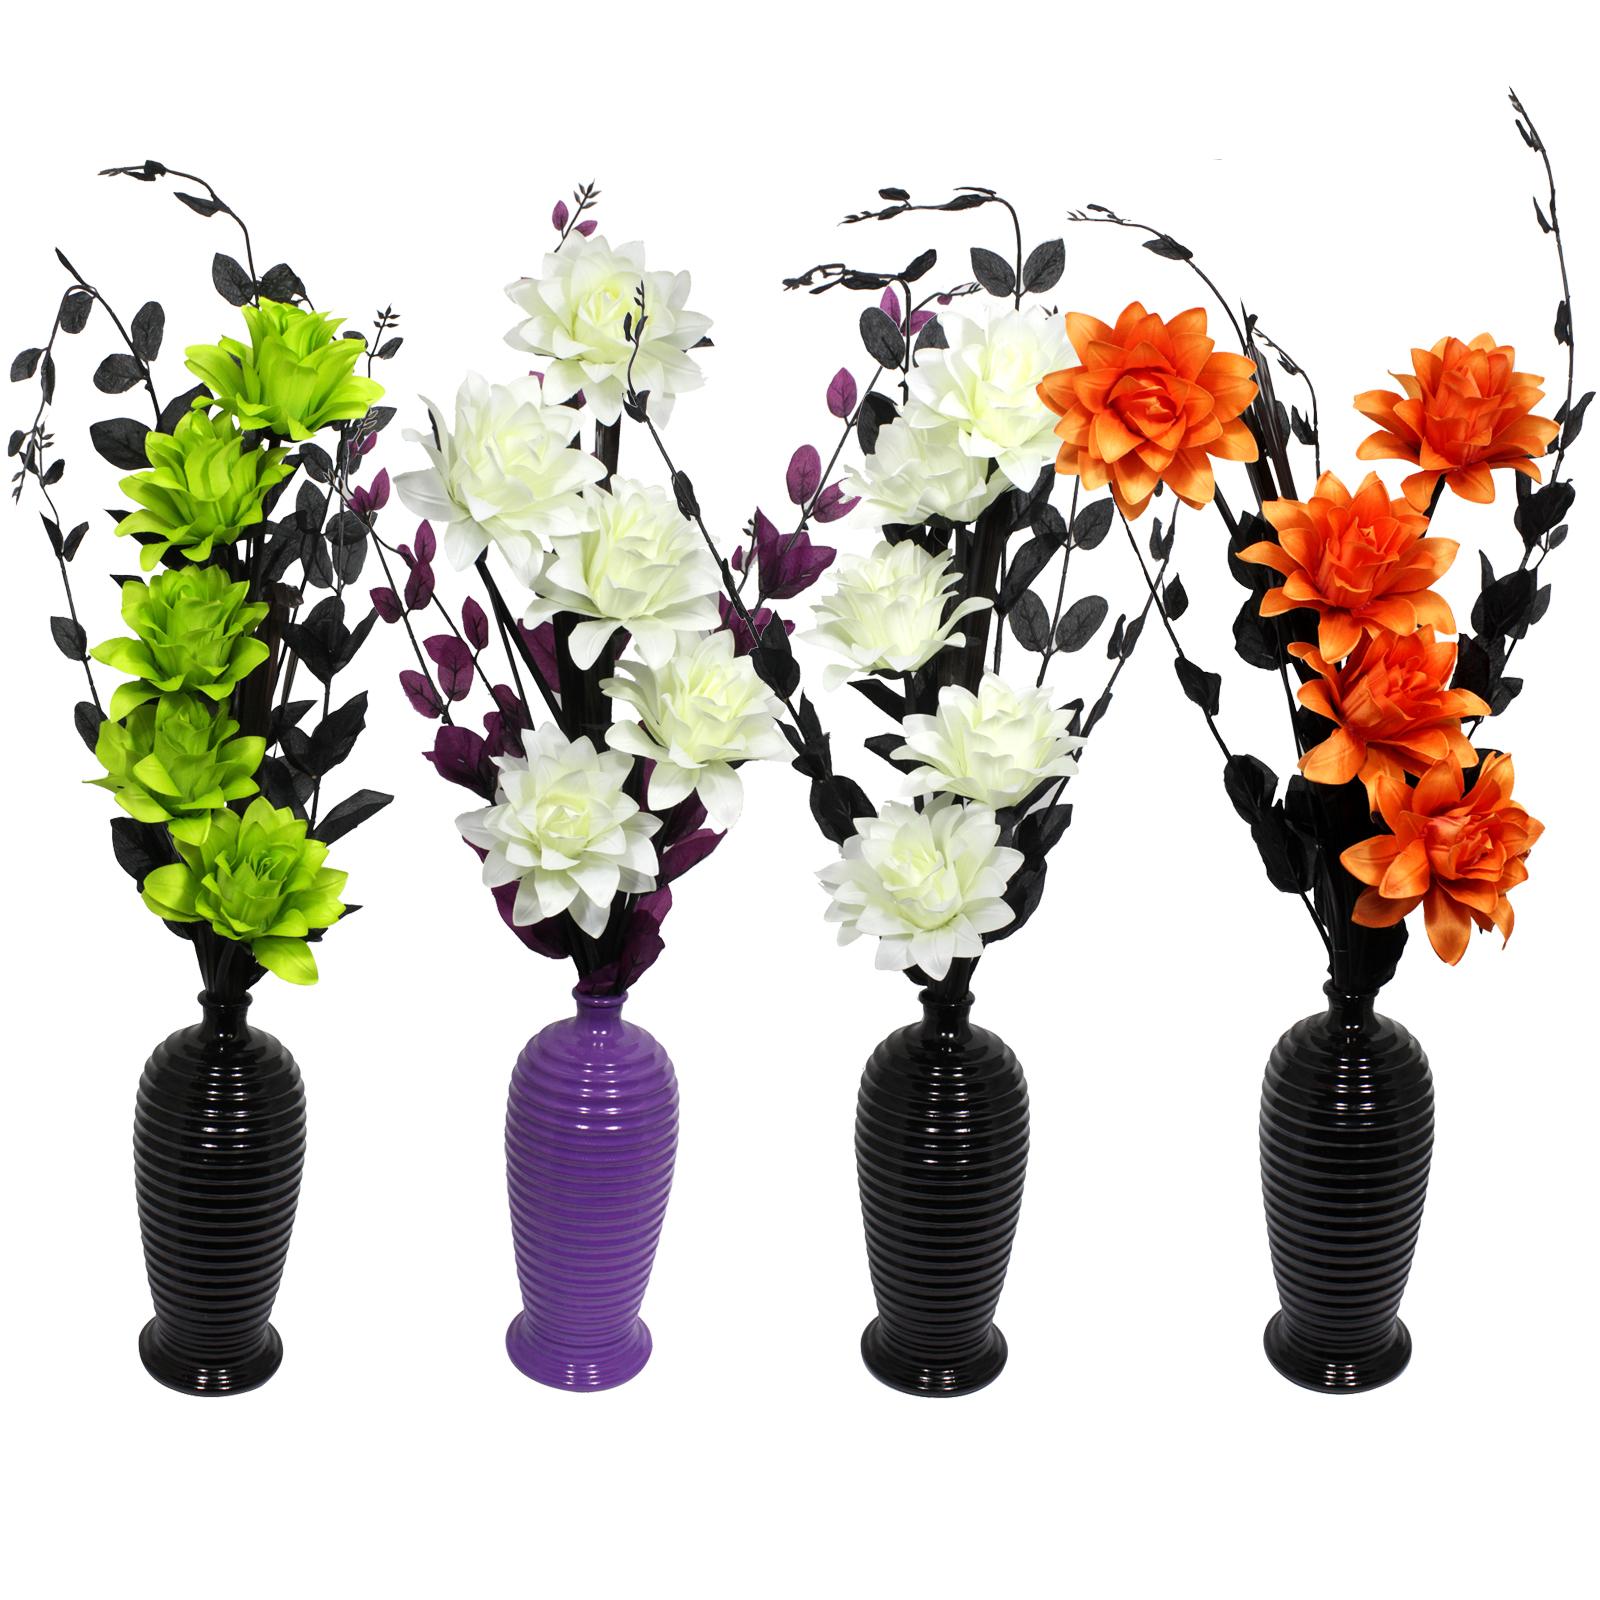 FLOURISH FLOWERS+VASE SILK FLOWERS 814A